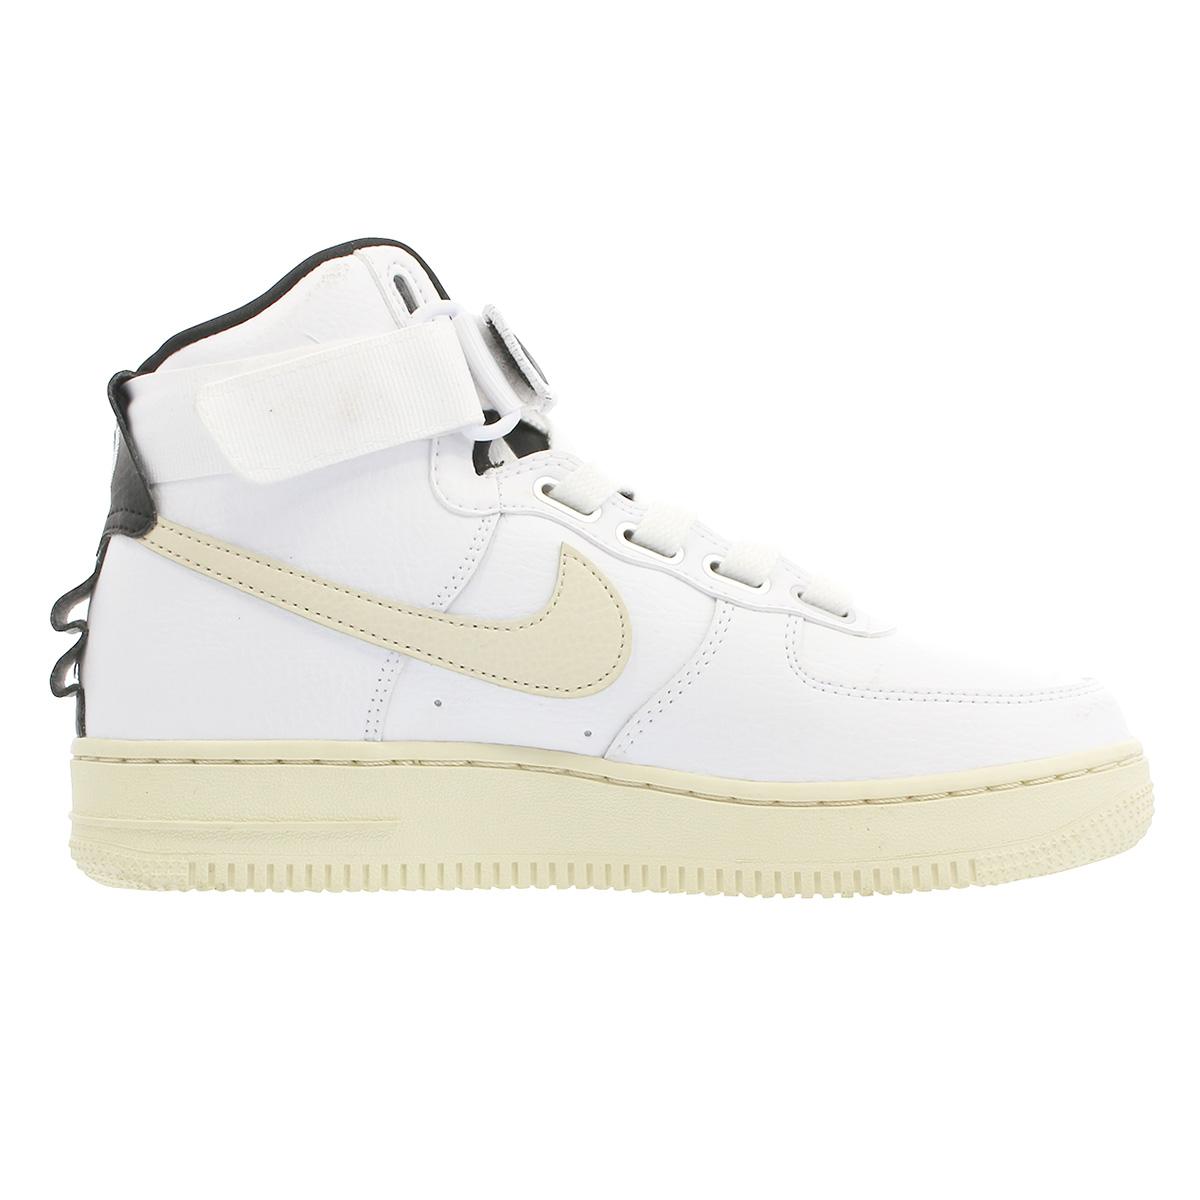 NIKE WMNS AIR FORCE 1 HI UTILITY Nike women air force 1 high utility WHITELIGHT CREAMBLACKWHITE aj7311 100